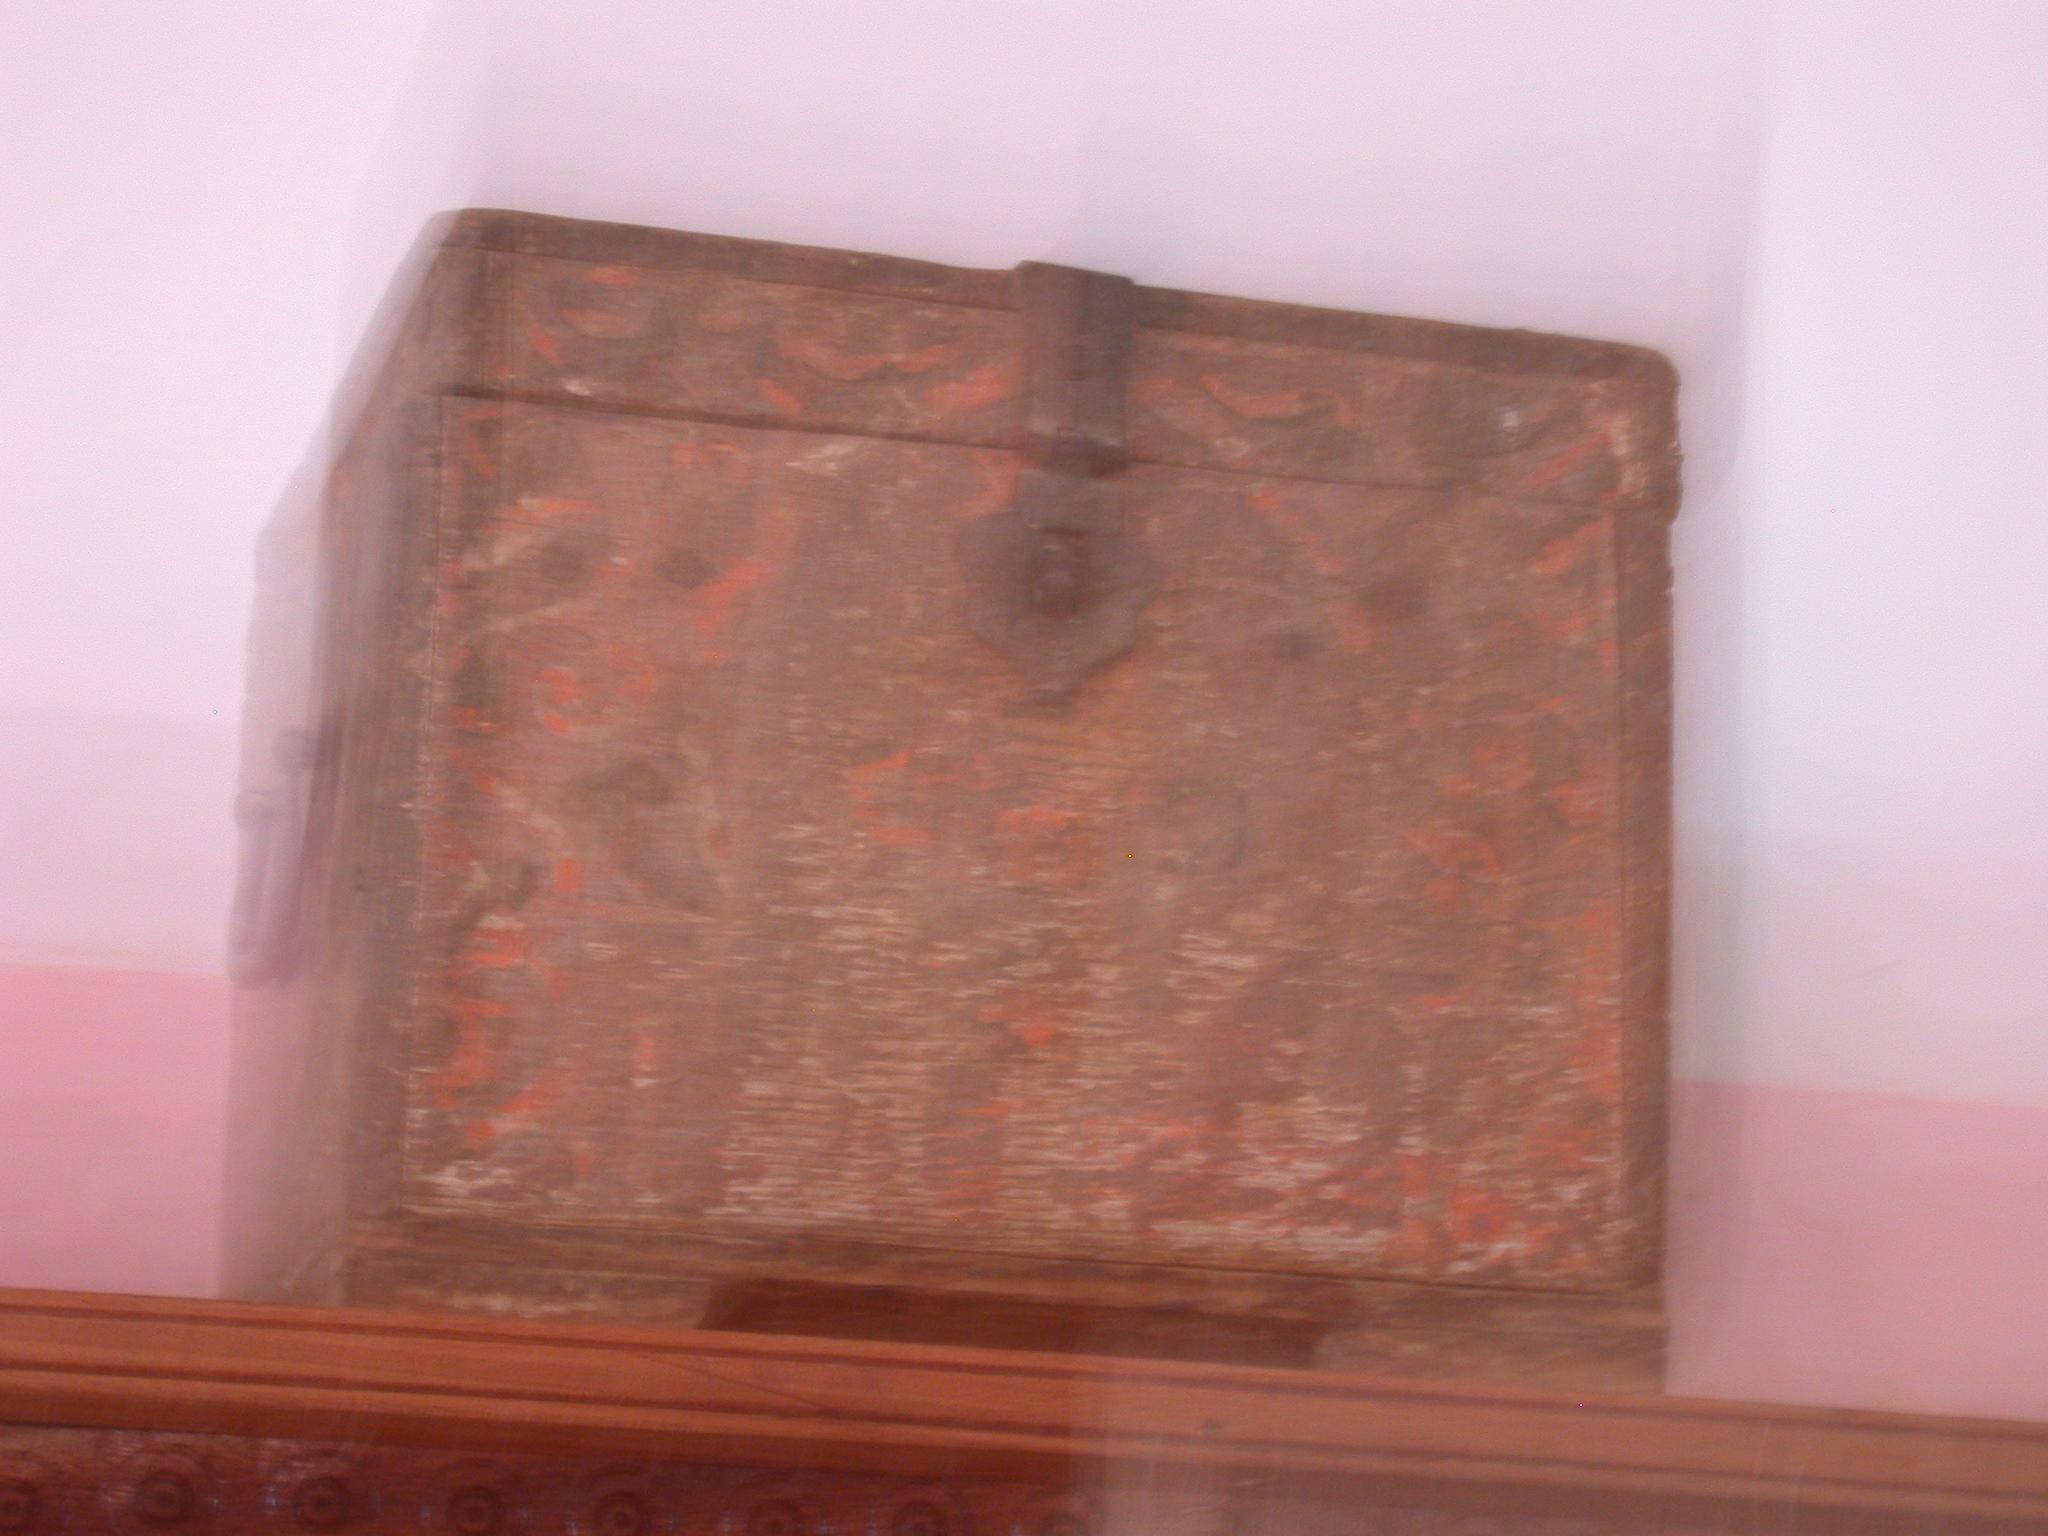 Ancient Manuscript Box, Manuscript Library, Timbuktu, Mali